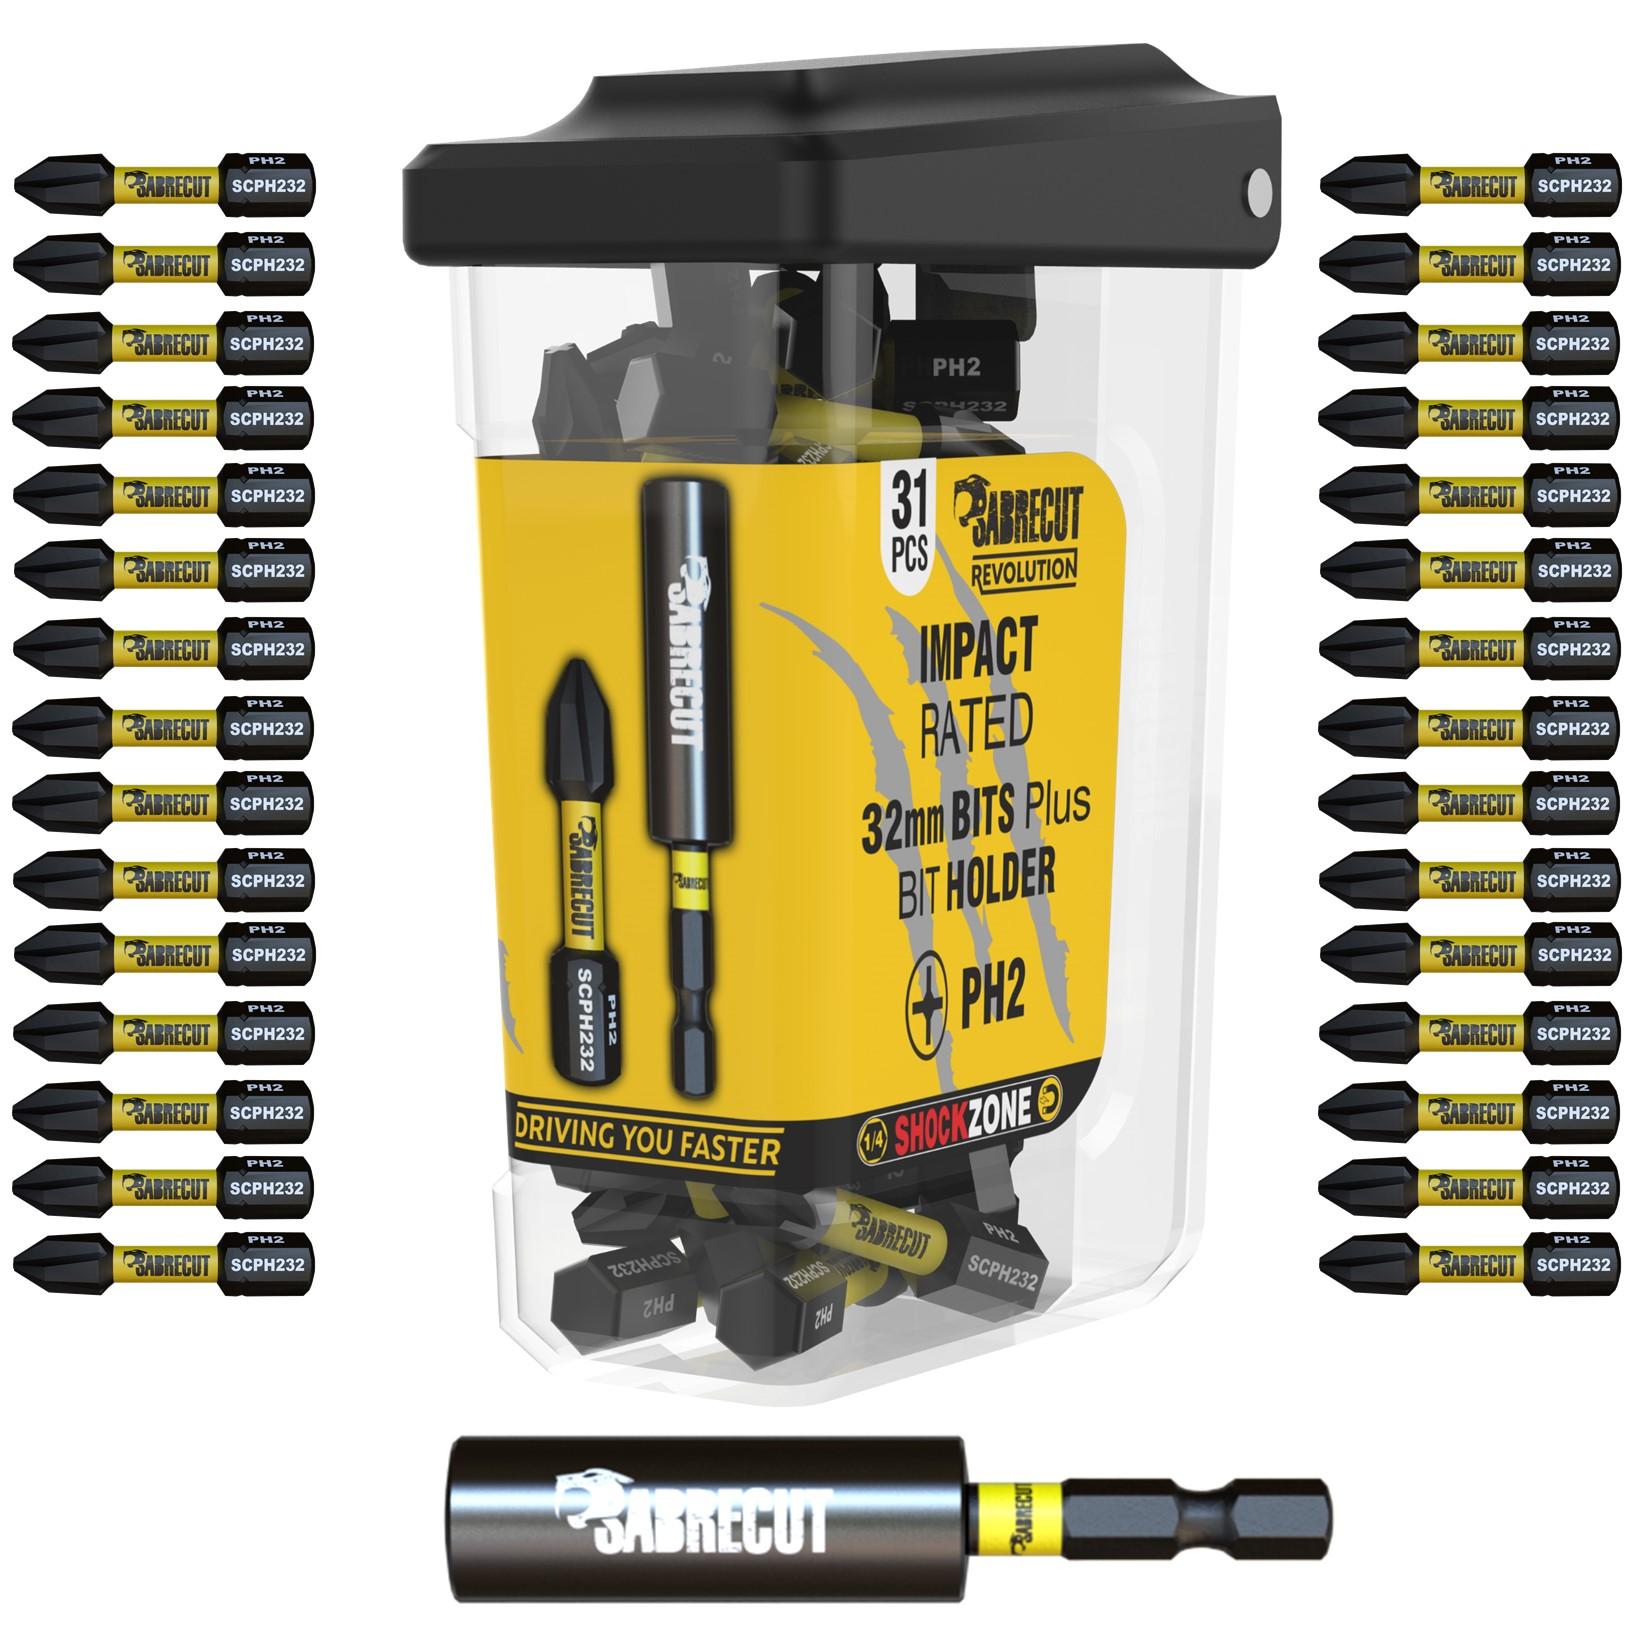 Pro Driver Bit PH2 Impact Duty Screwdriver Pack of 15 Drill Driver Bits Sets Black 25 mm OX